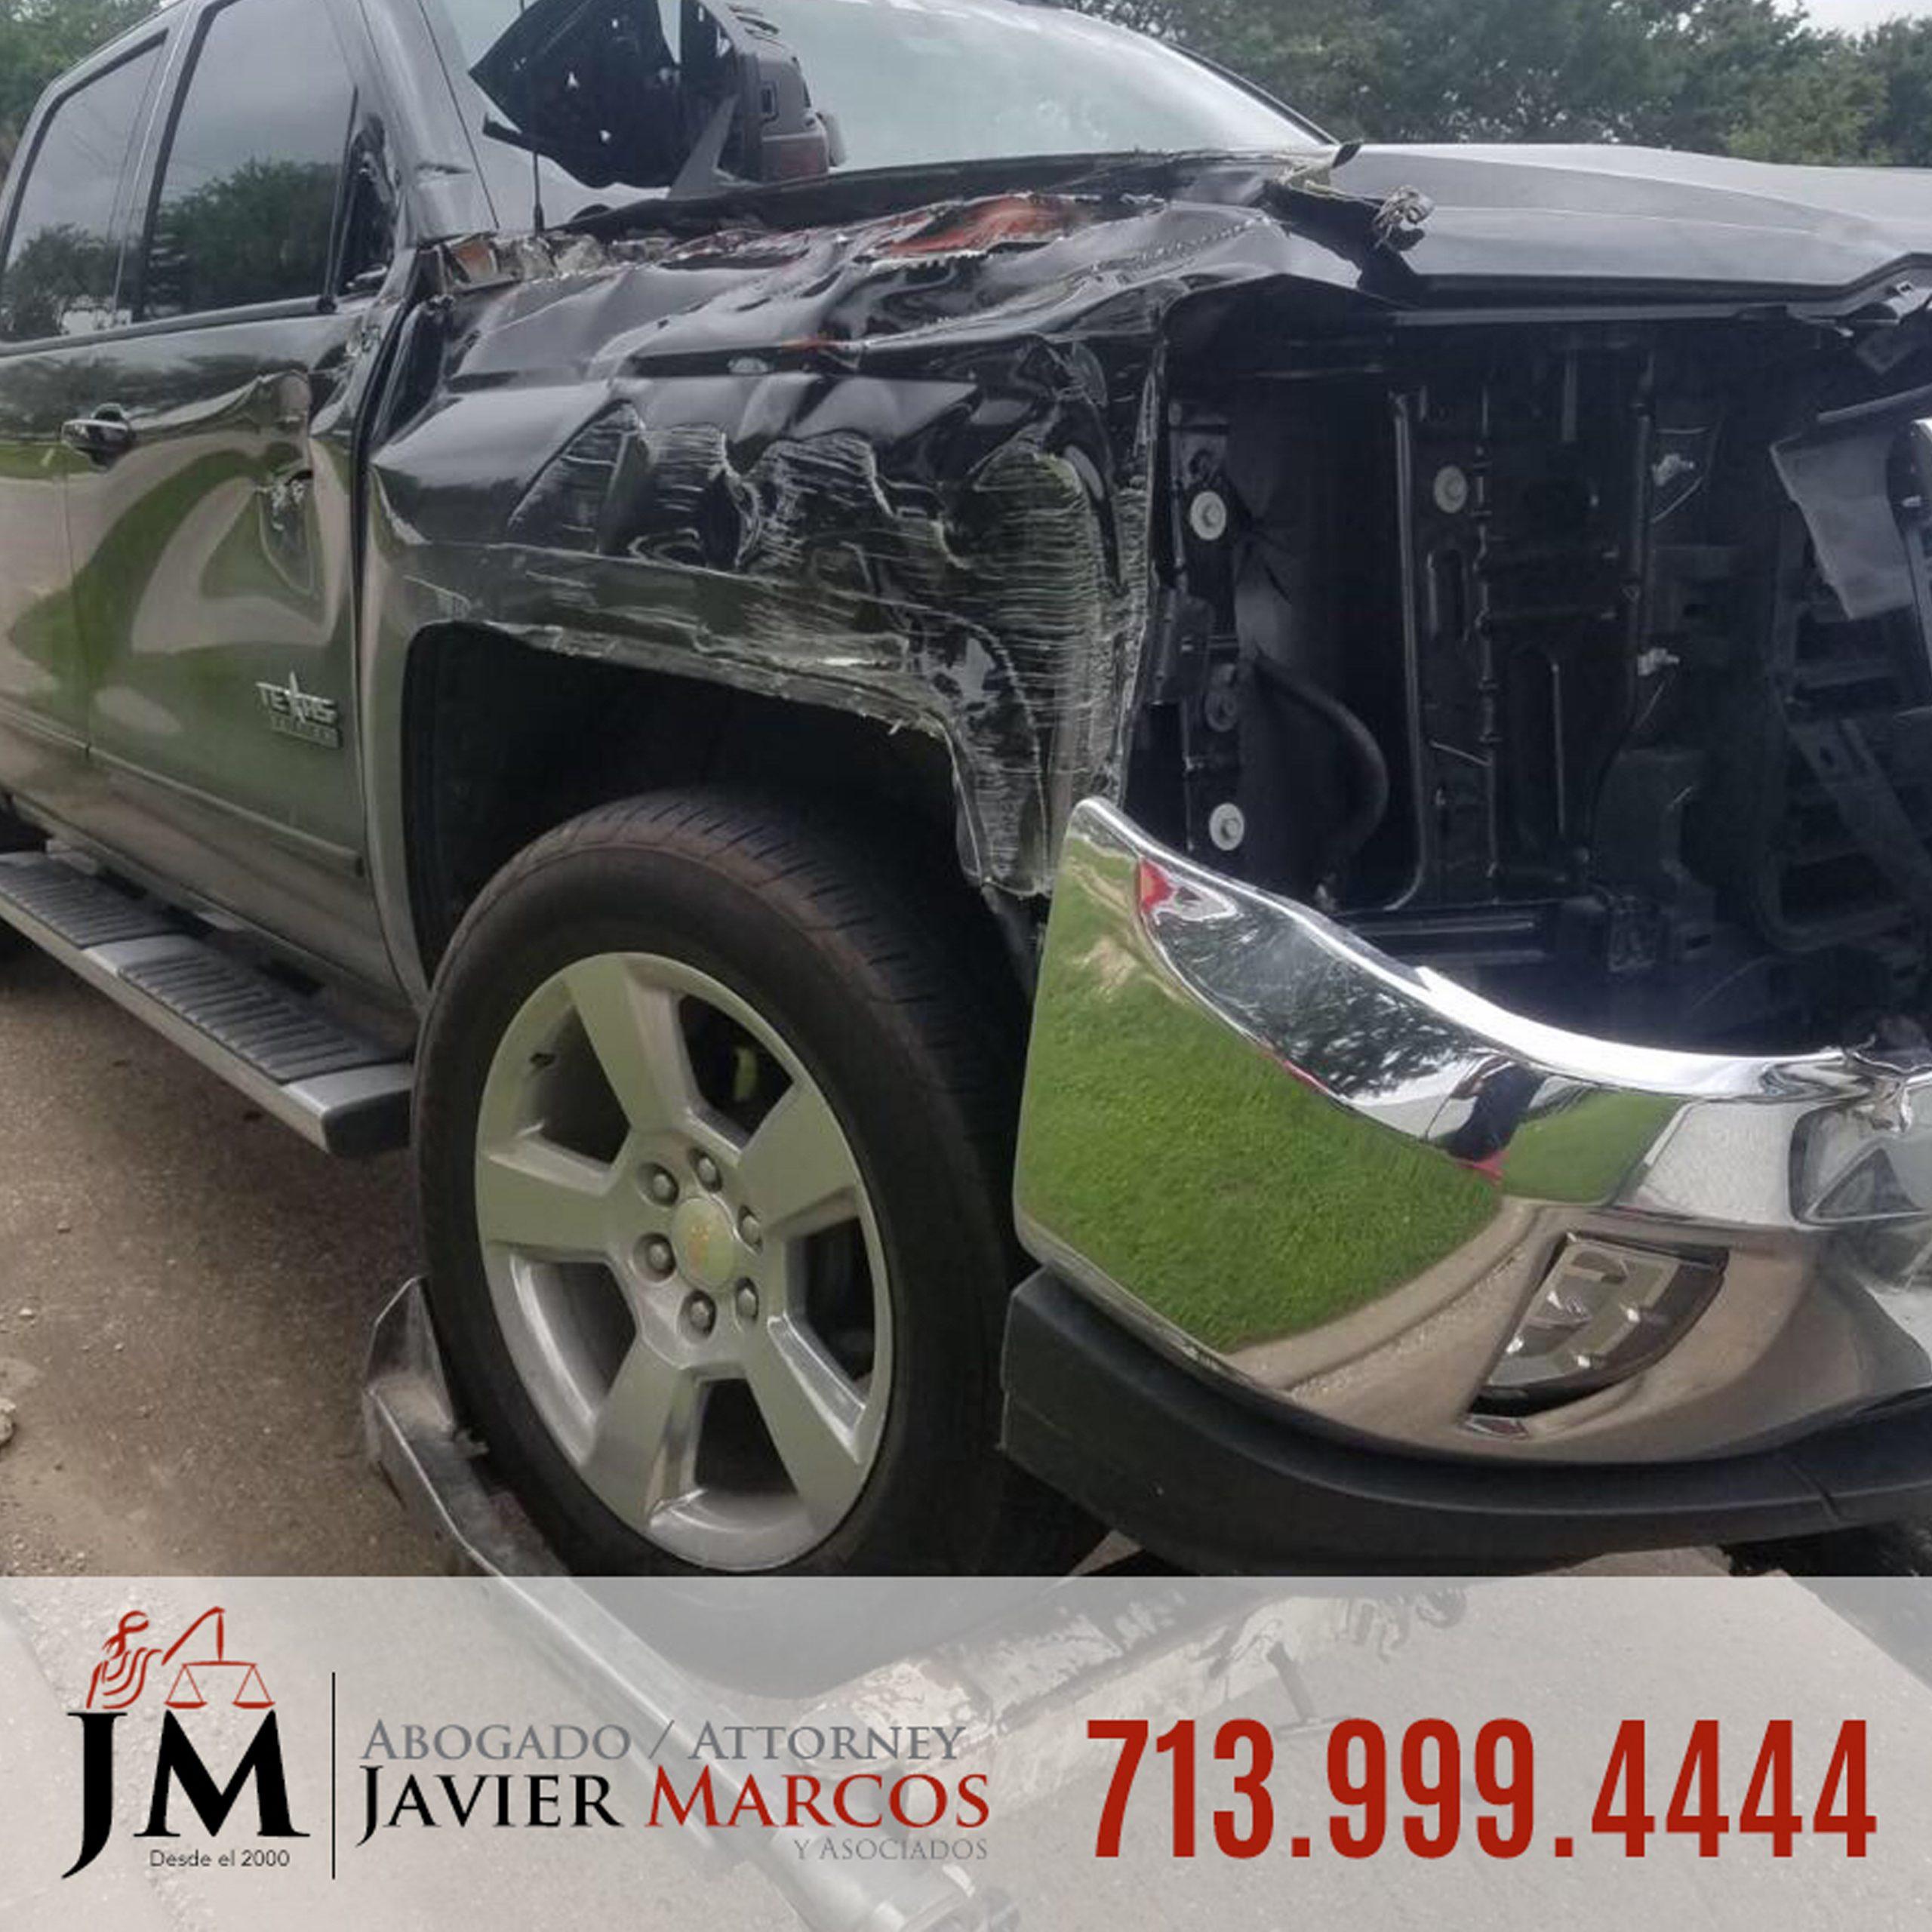 Importancia de un Abogado para Accidentes | Abogado Javier Marcos | 713.999.4444